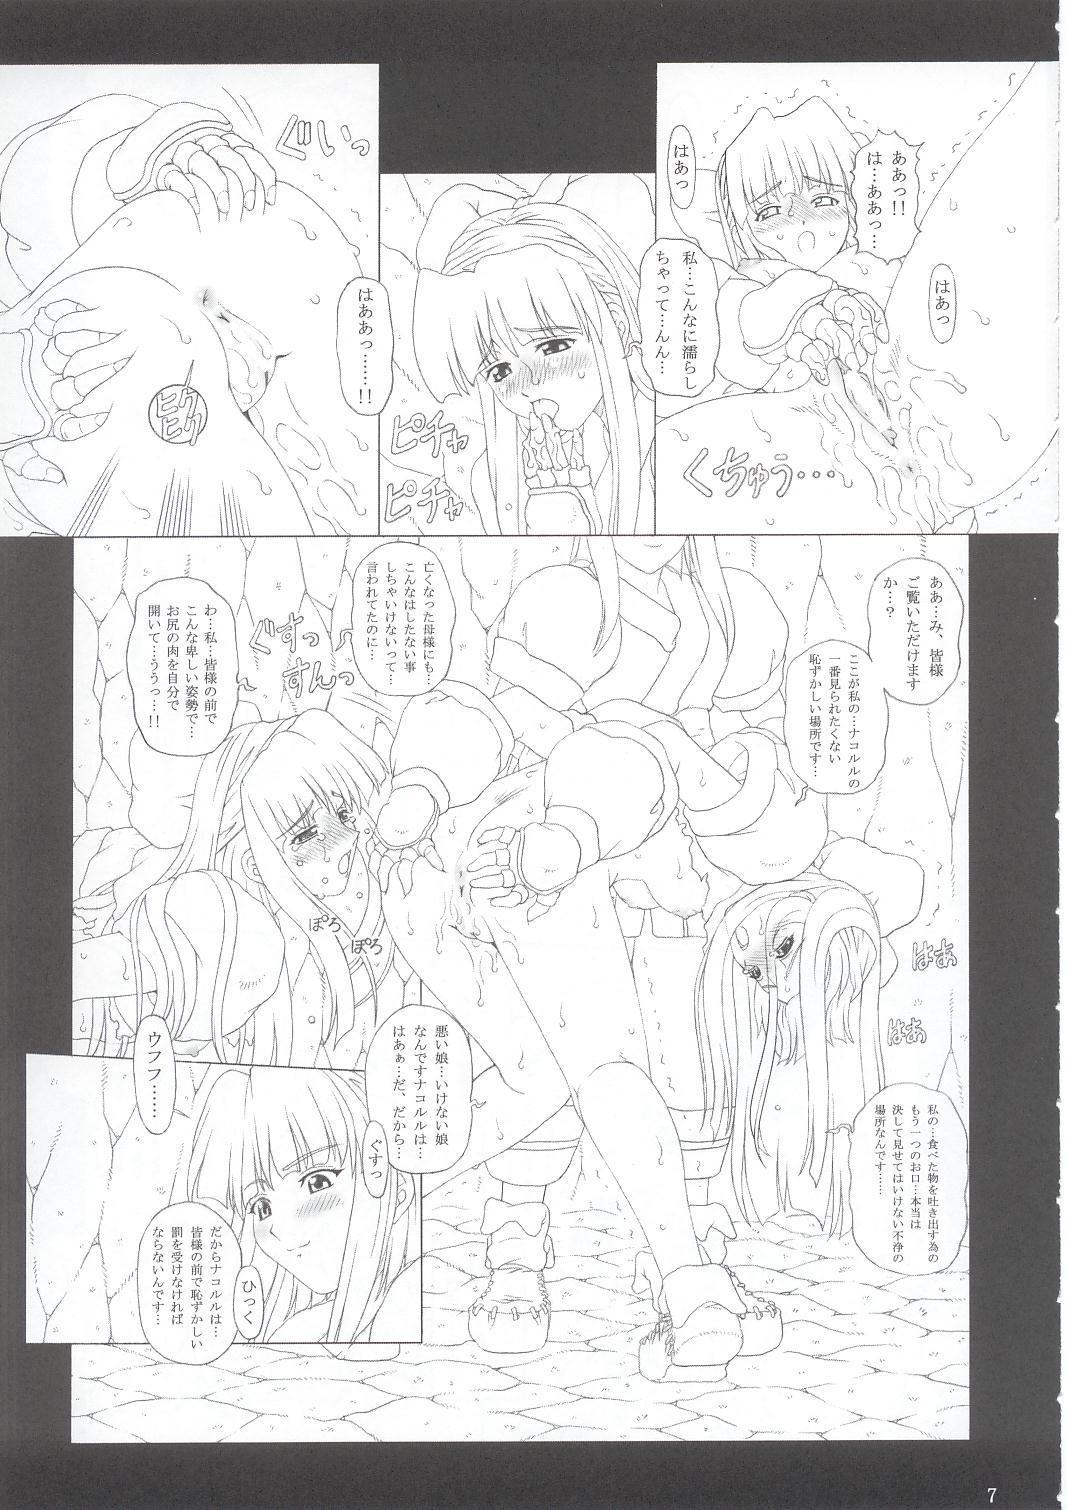 JUNK Dain no Miko San 5